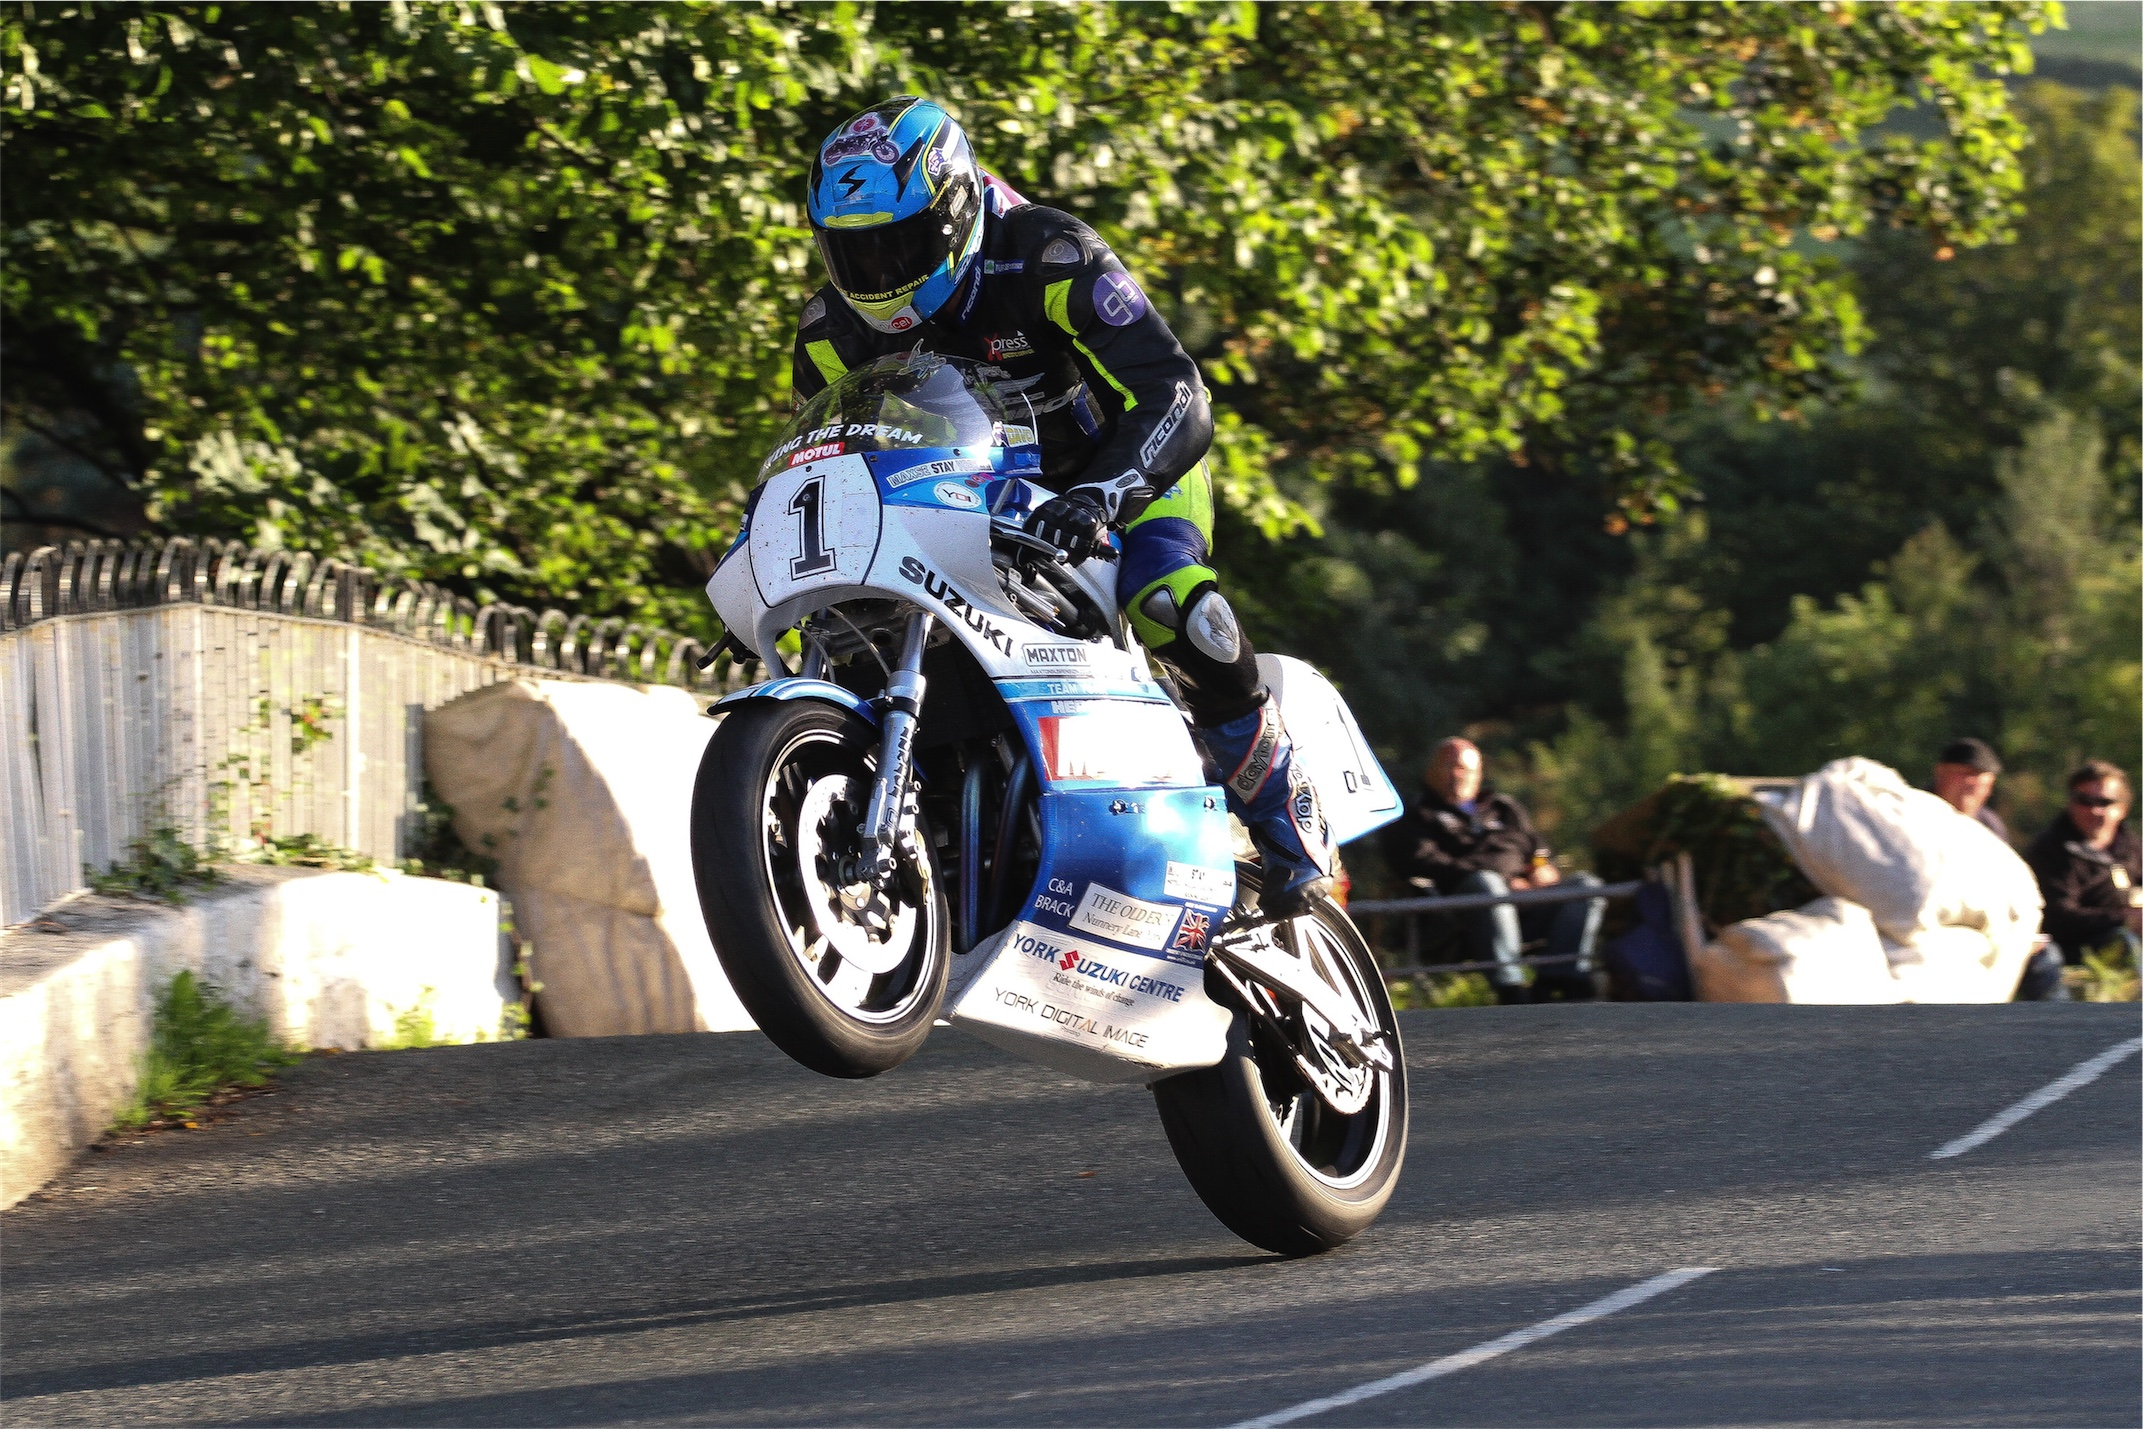 David Johnson Looks Forward To Classic TT Challenge With Team York Suzuki